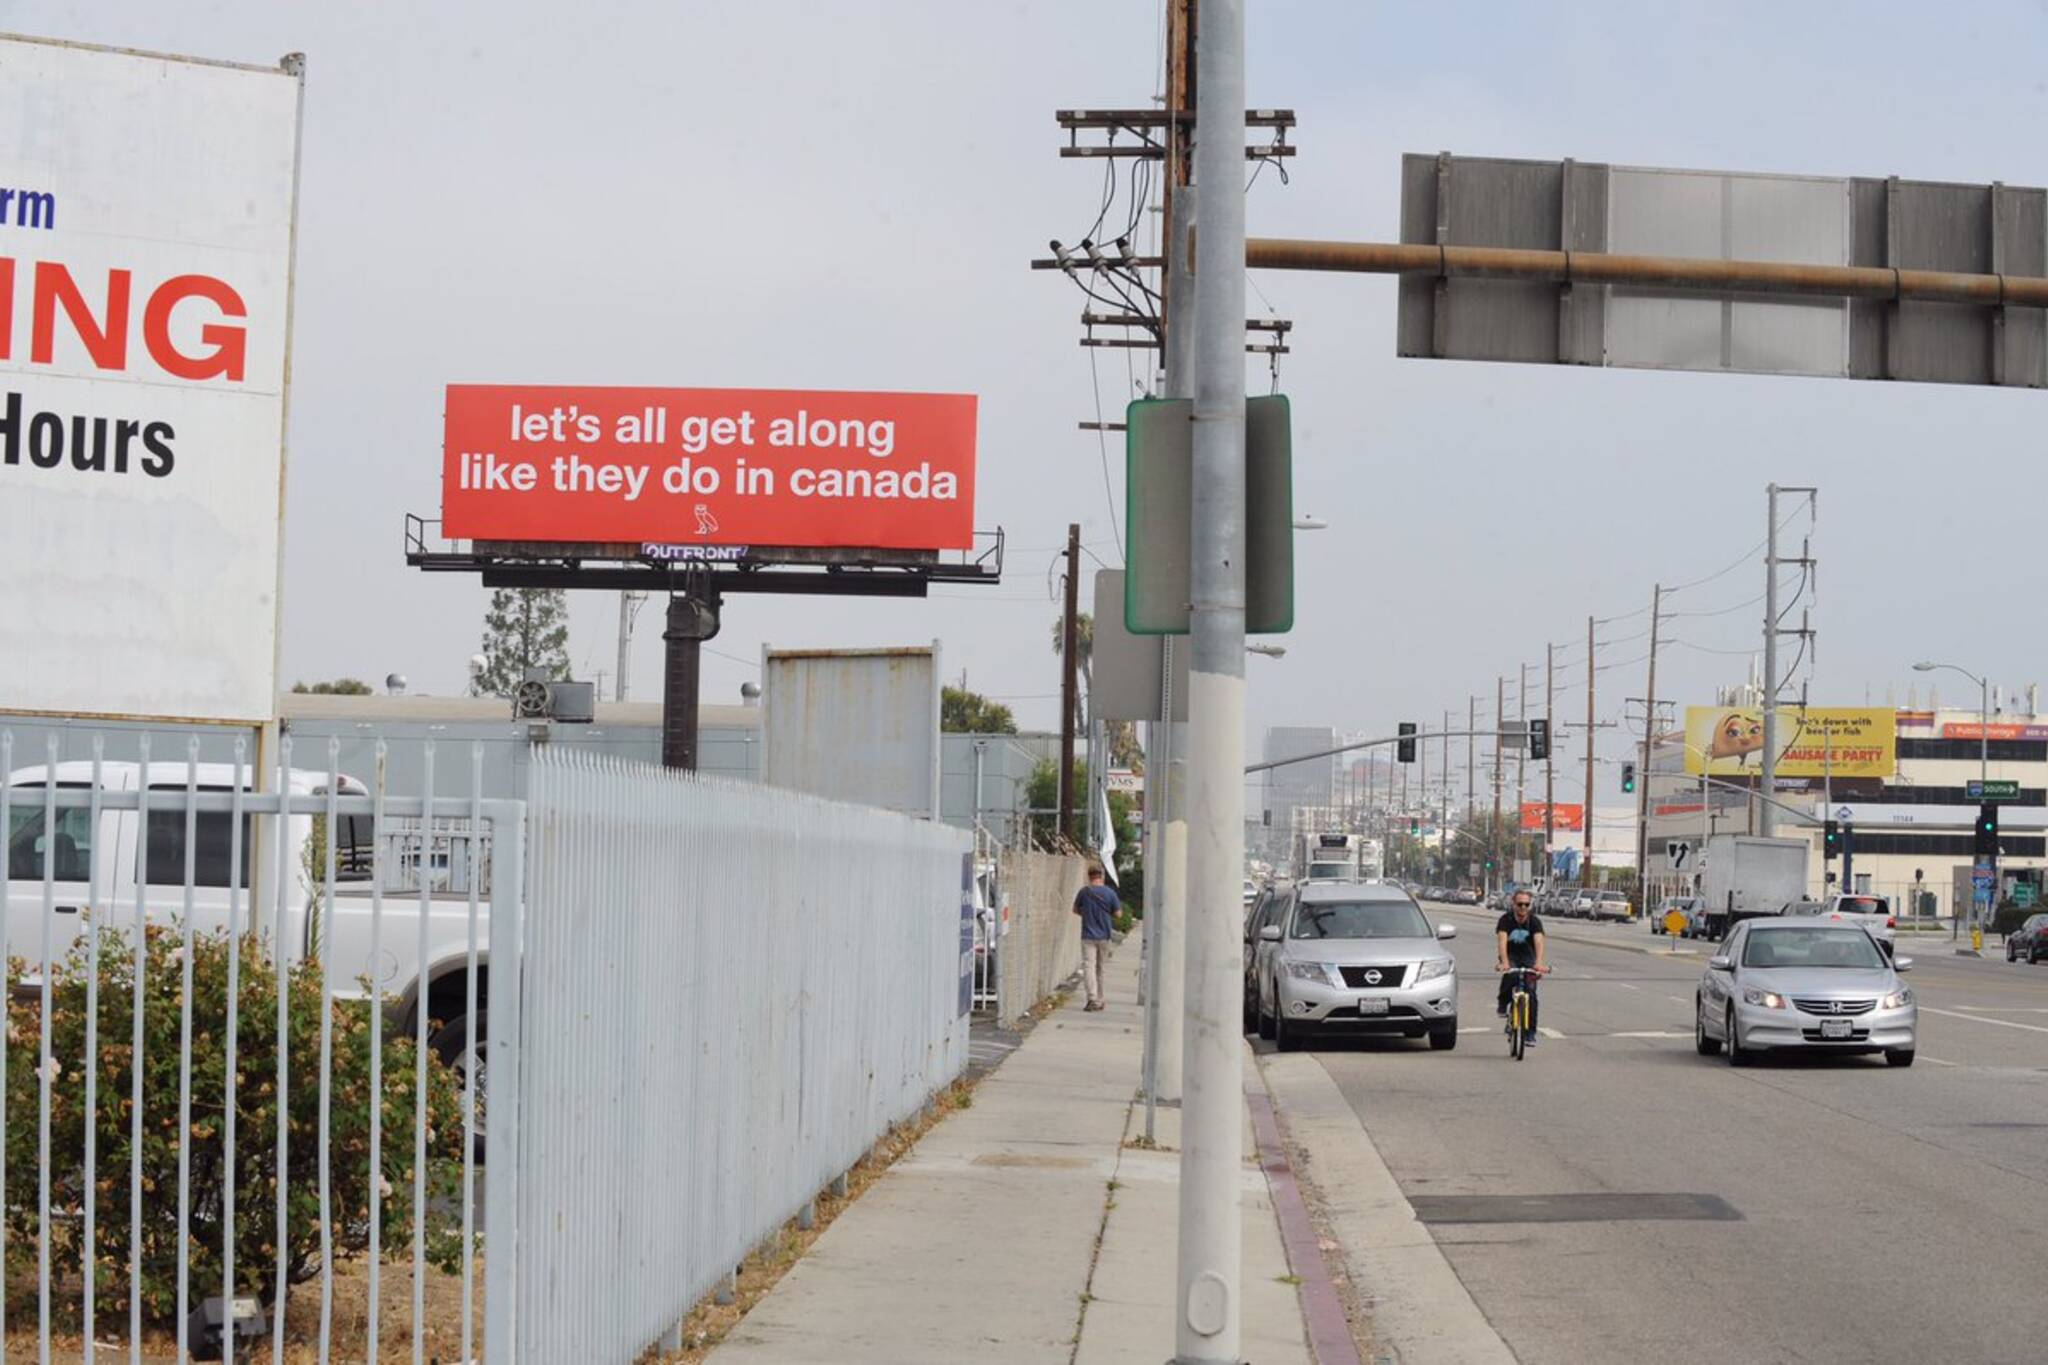 drake toronto billboard